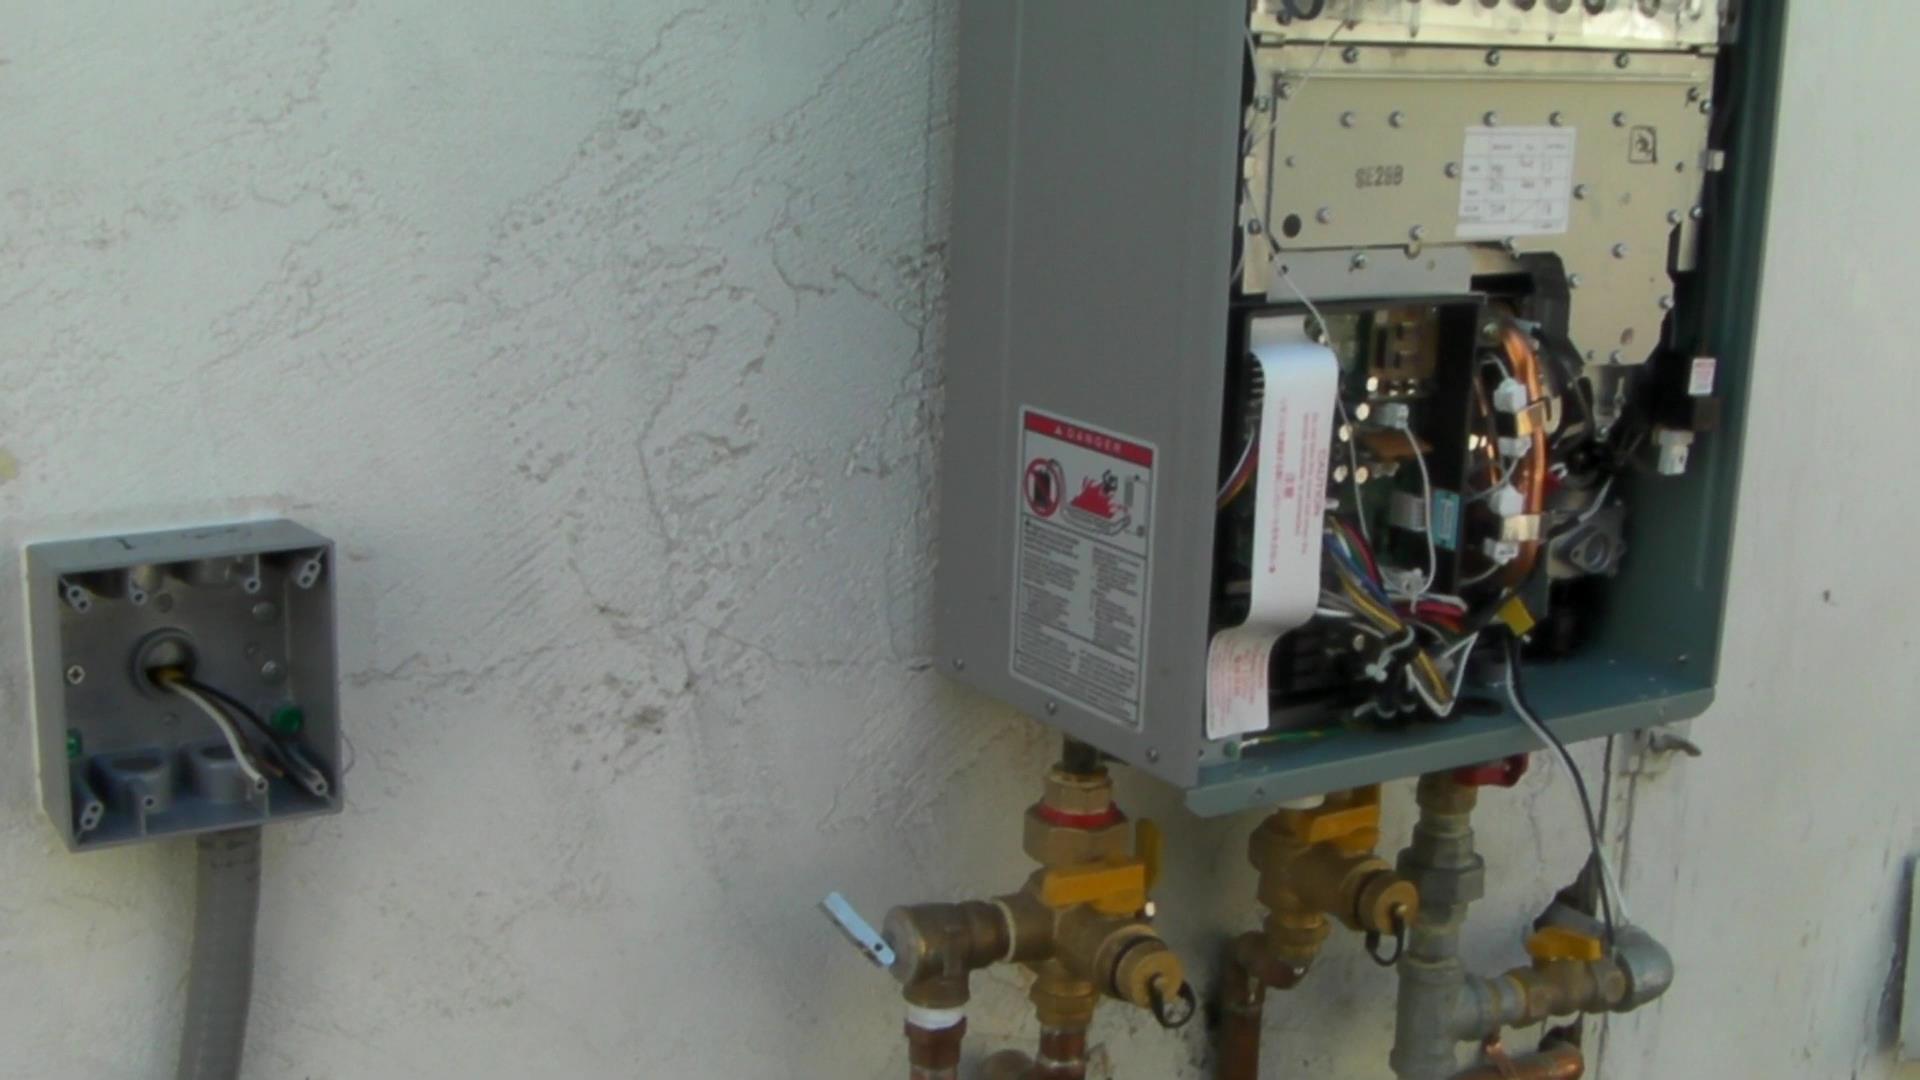 rheem tankless electric water heater wiring diagram volvo penta alternator bosch parts